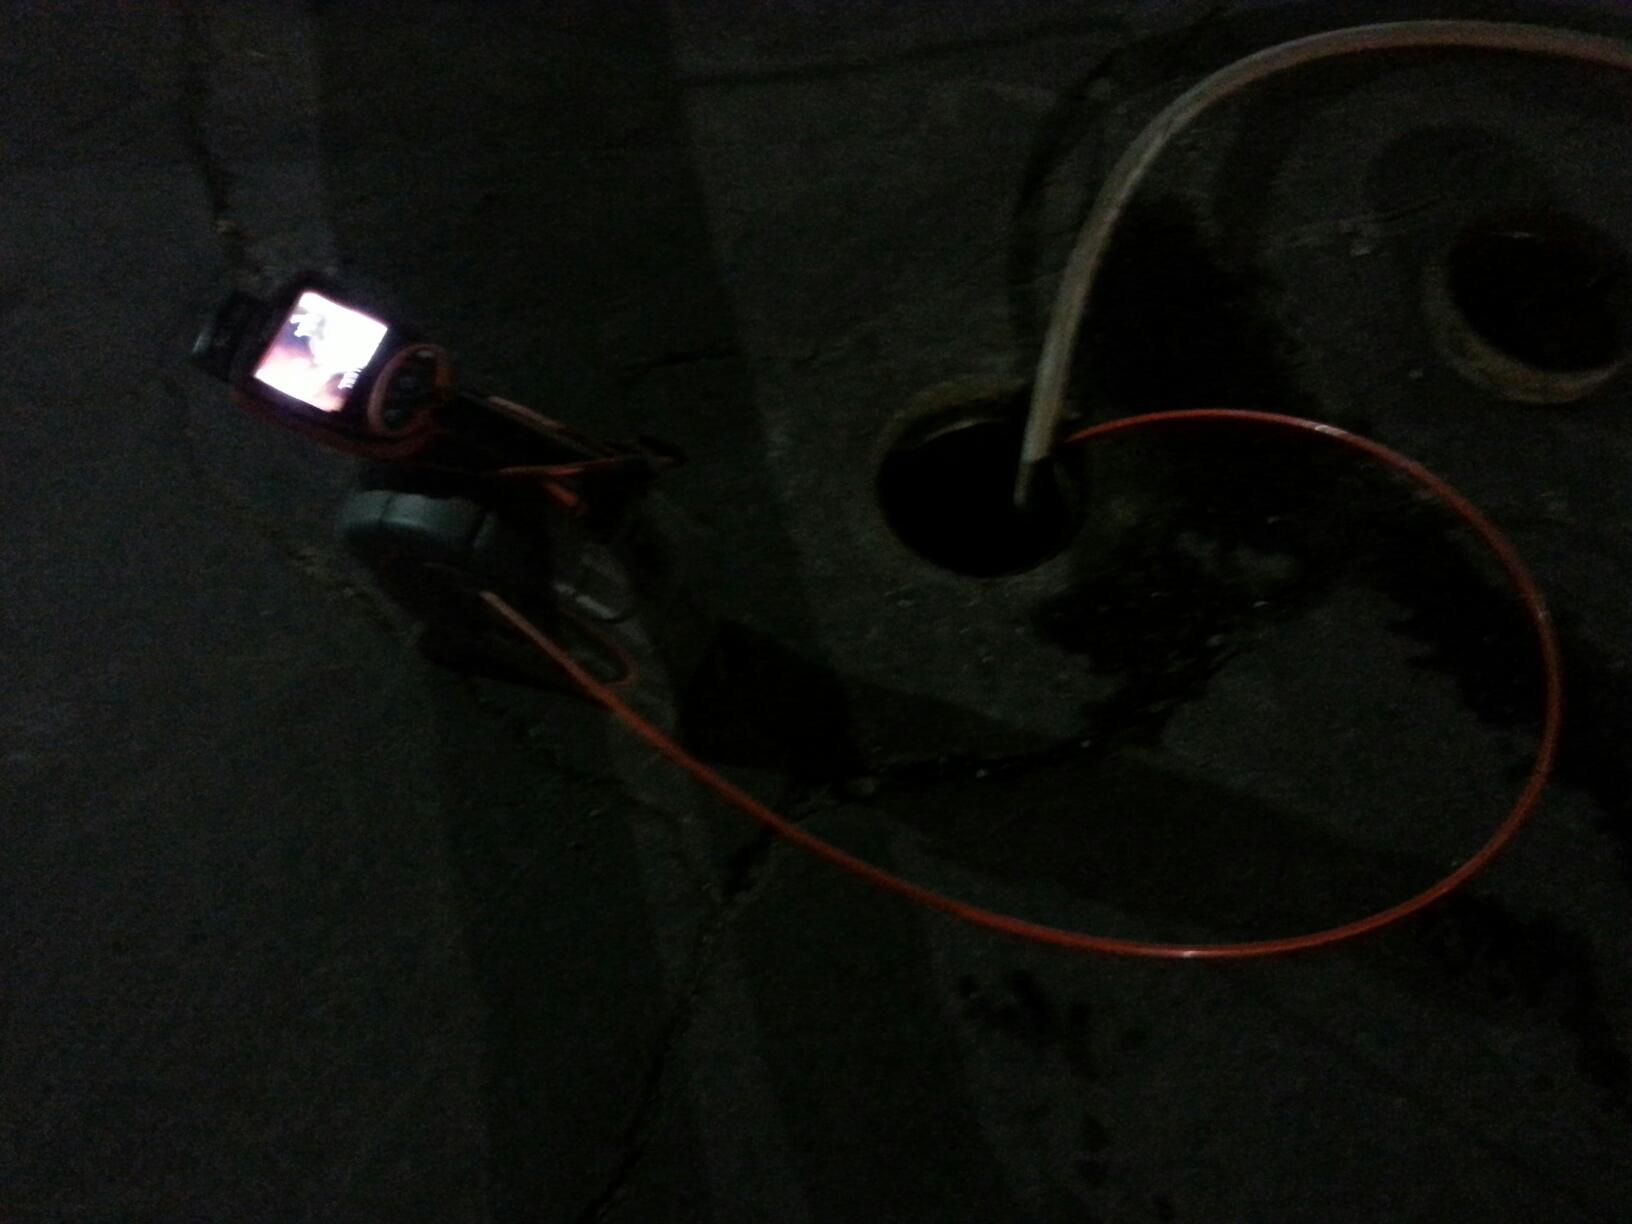 Rancho Cordova, CA - Checking a main sewer line for blocks using Camera and locator. Making sure water flows.